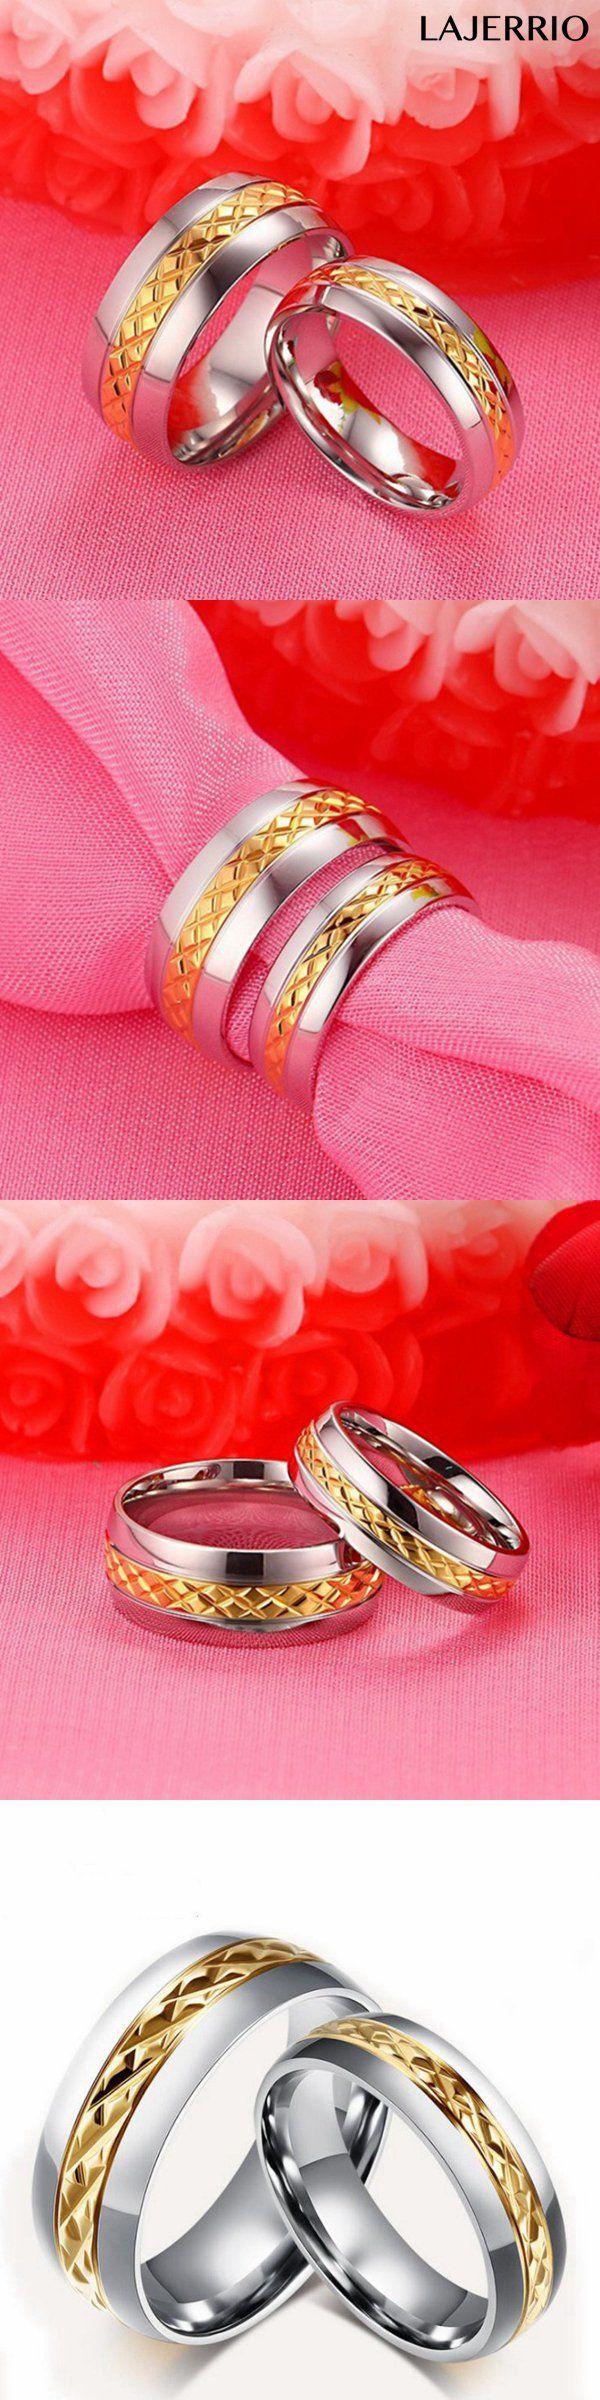 The 19 best Promise rings images on Pinterest | Commitment rings ...